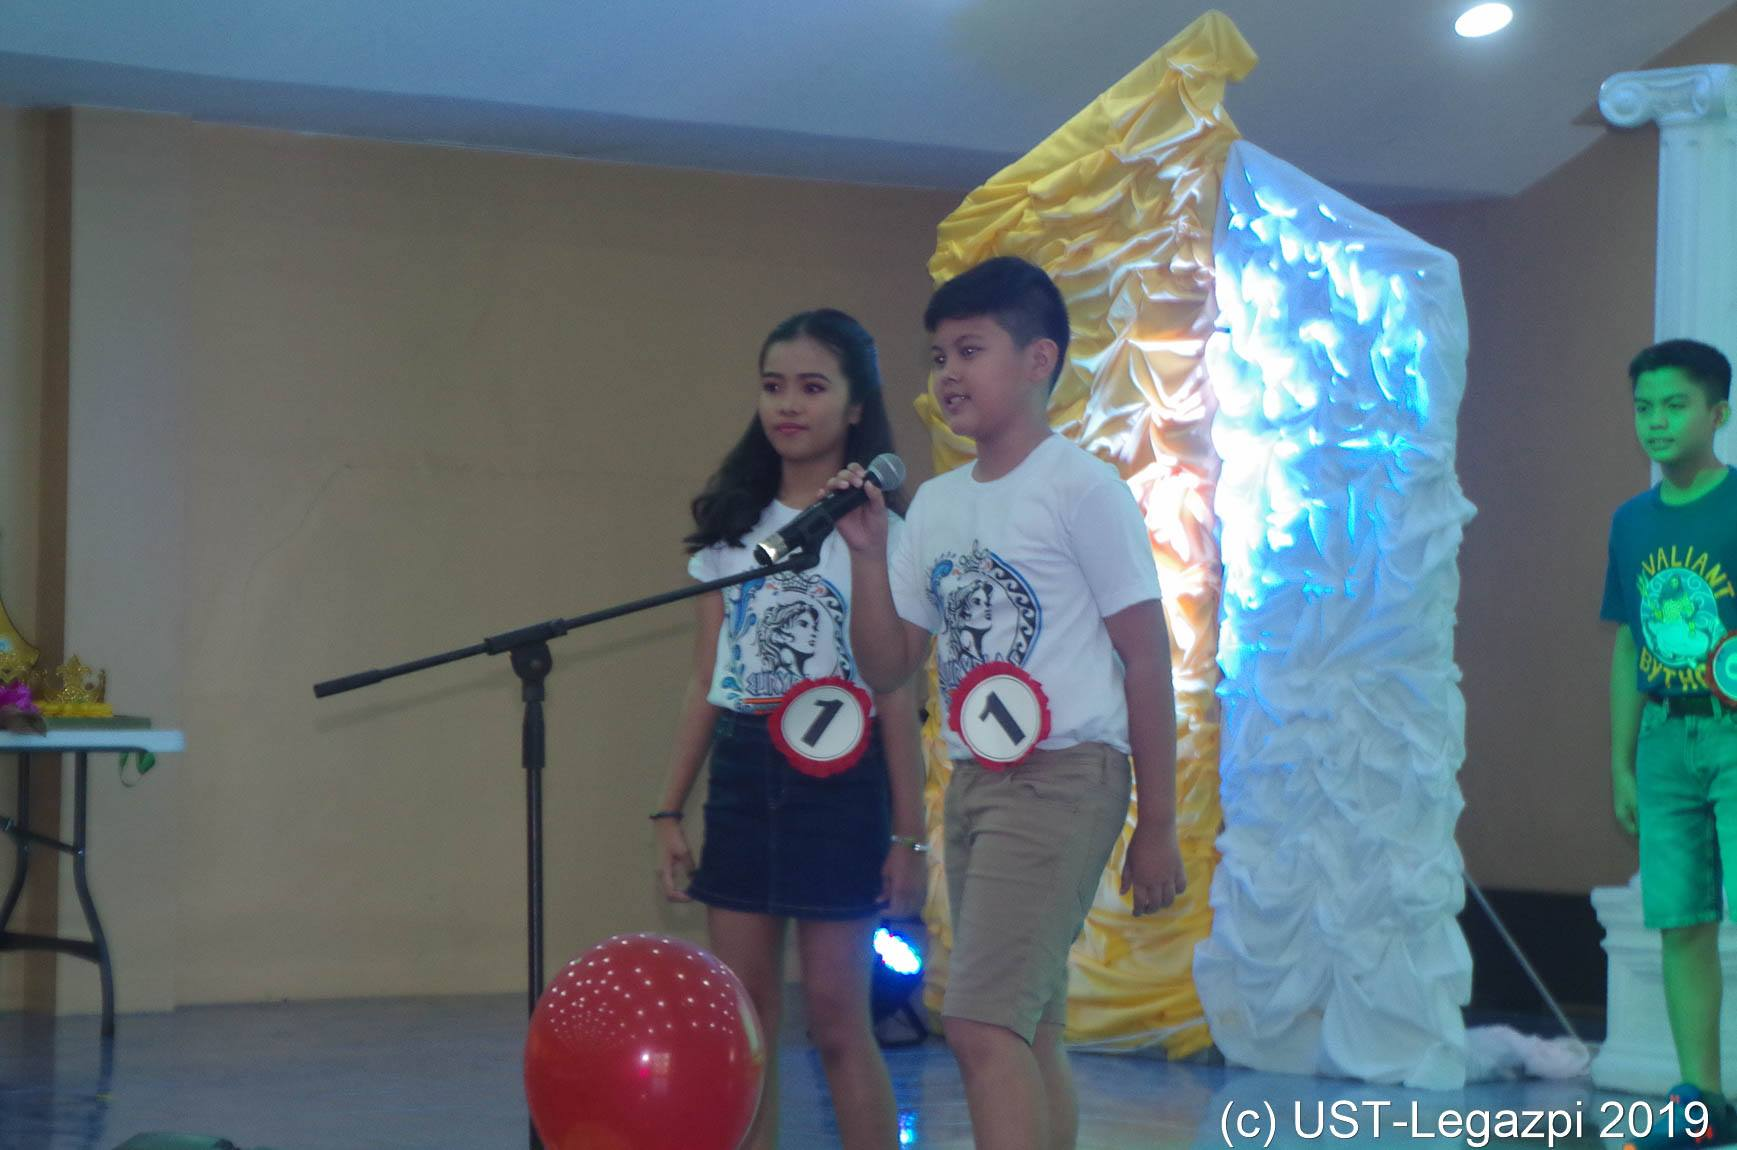 Mr. & Ms. AQUILYMPICS & LITMUSDA